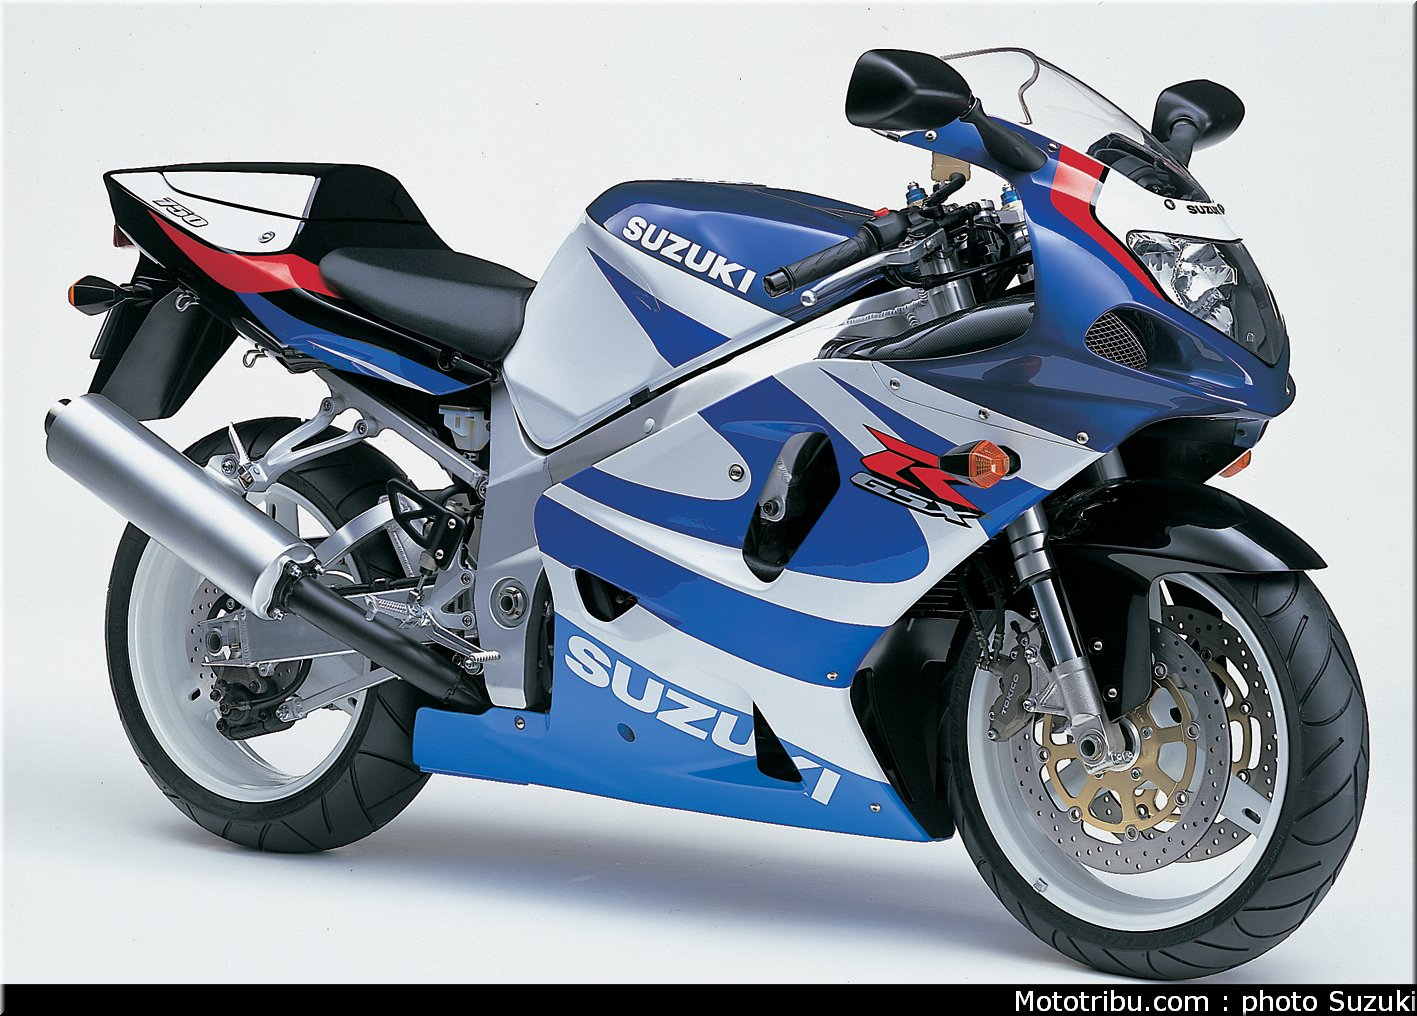 Wallpaper 2008 Suzuki Gsxr 600 Wallpaper 2008 Suzuki Gsxr 600 750 1000 1417x1016